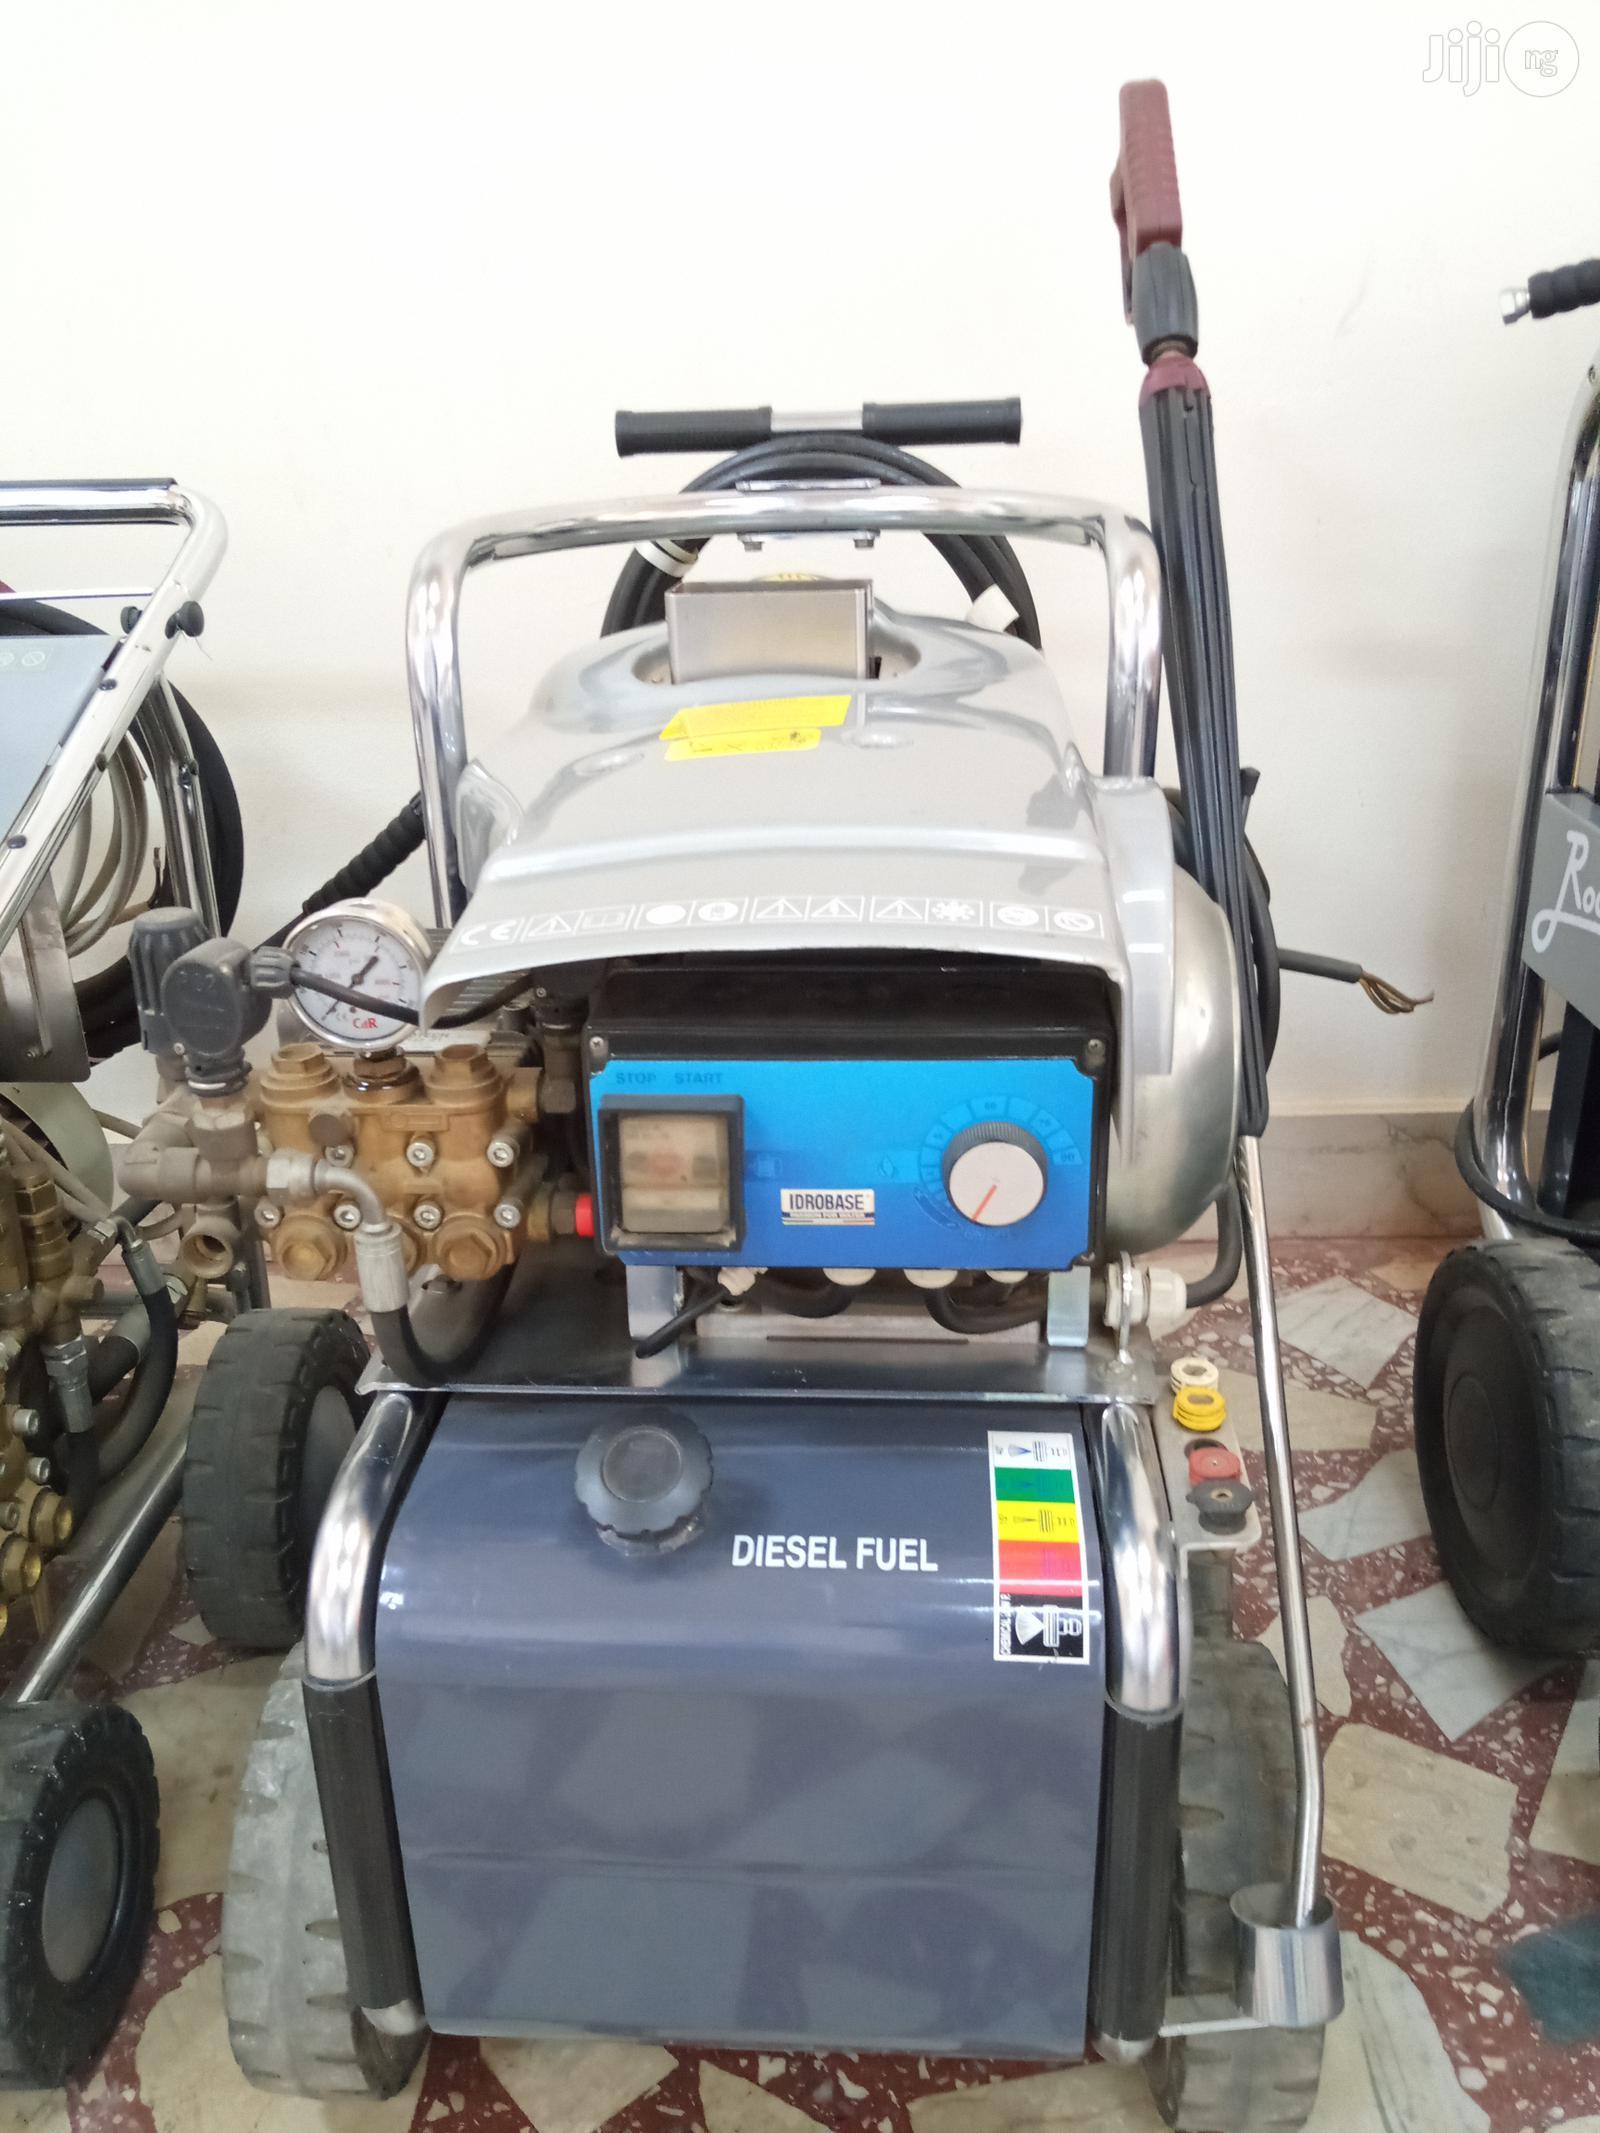 High Pressure Idrobase Washer Machine